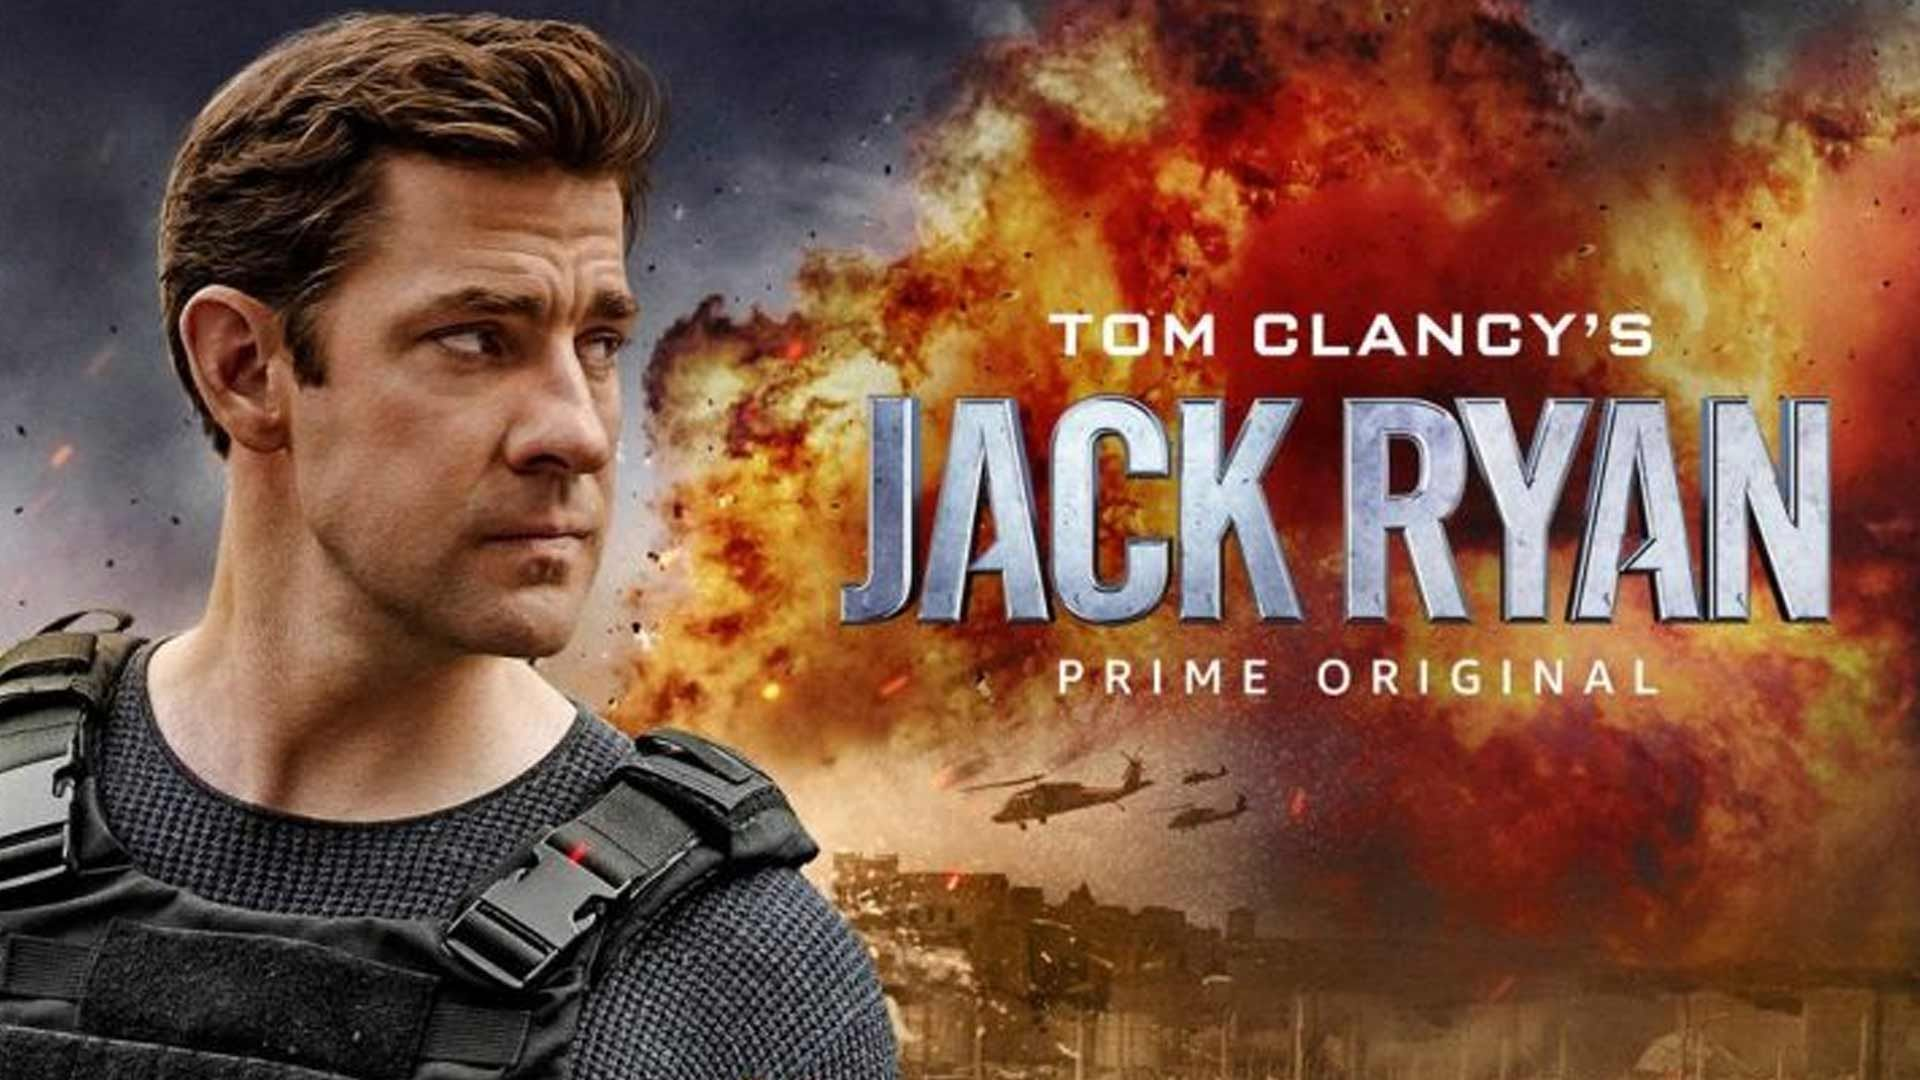 tom clancy's jack ryan wallpaper